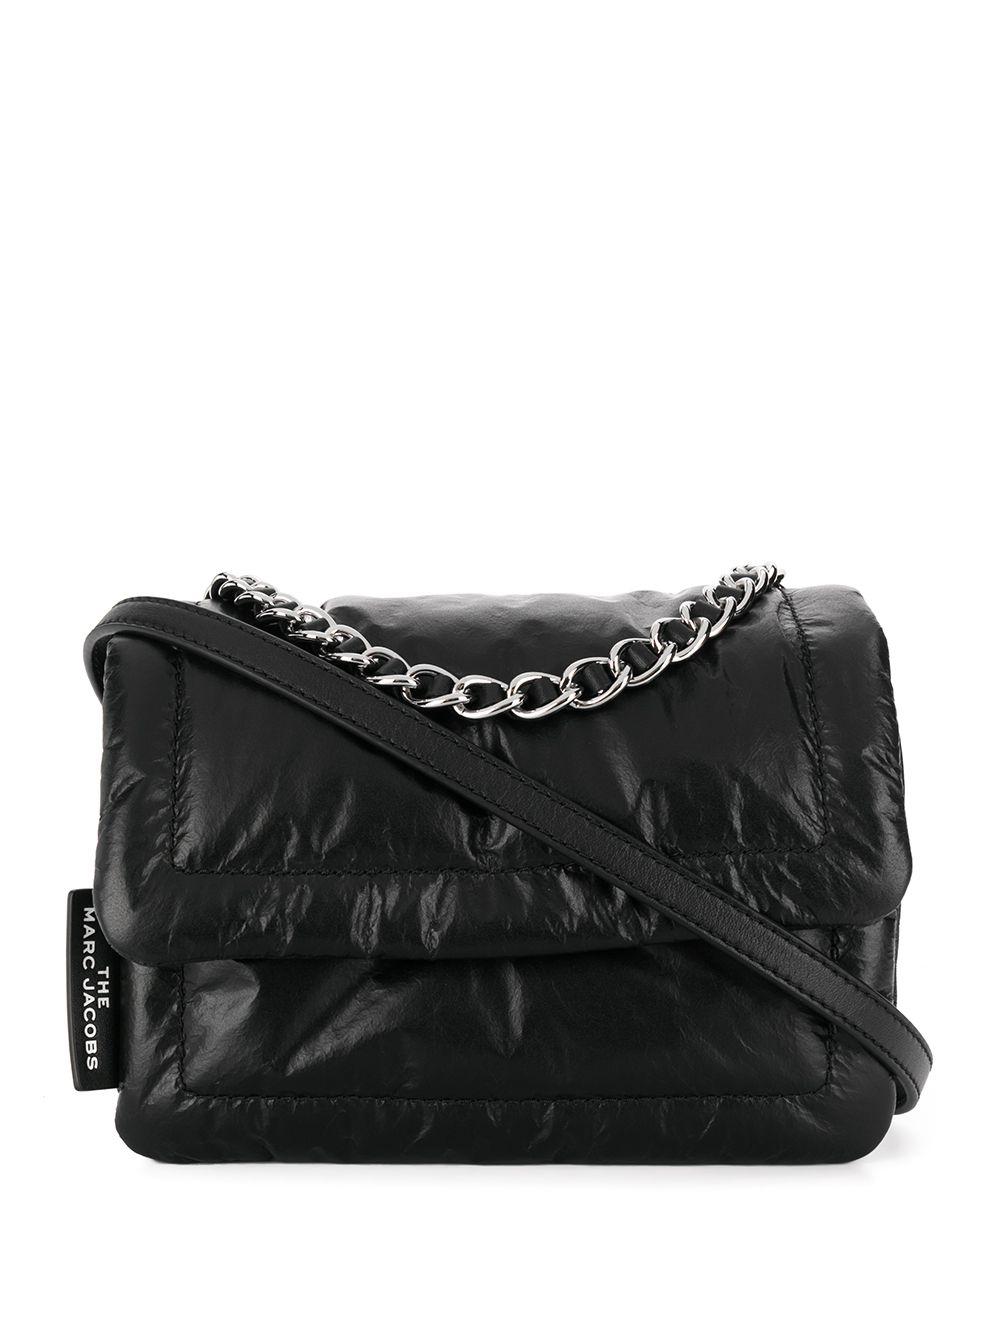 Pillow Mini Leather Shoulder Bag